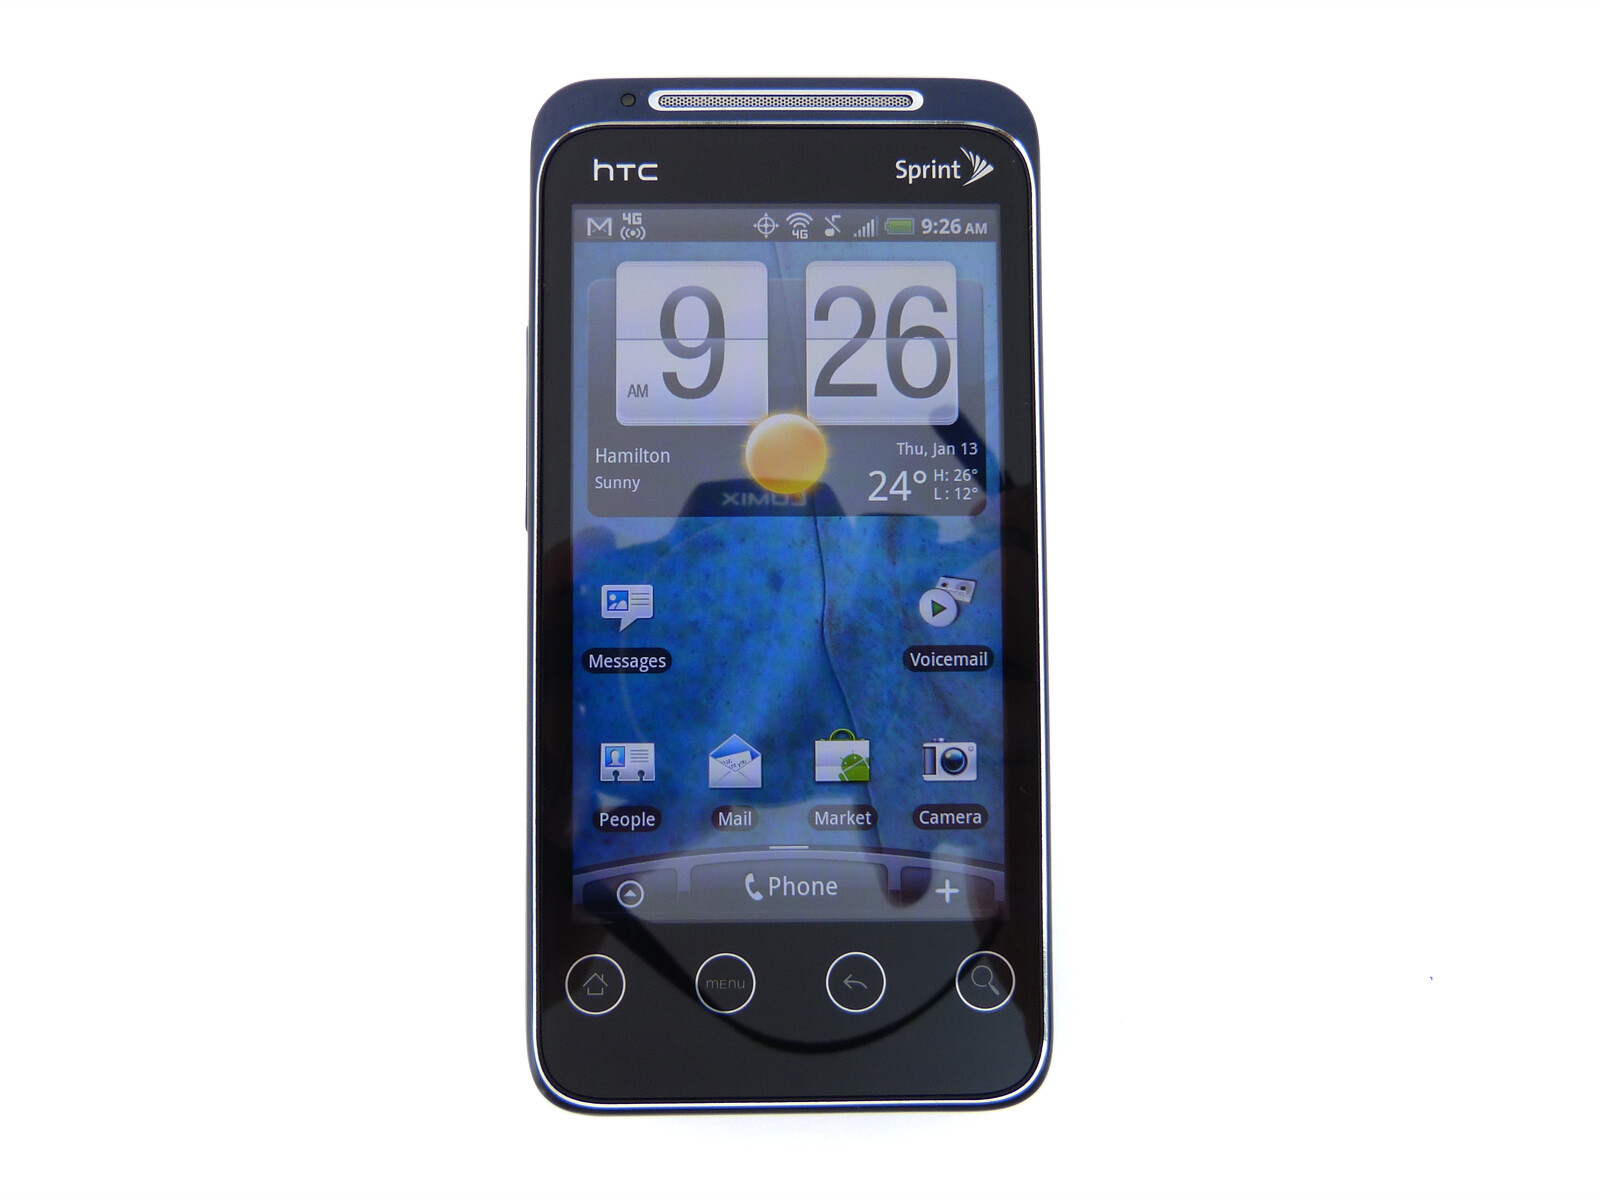 htc evo shift 4g service manual user guide manual that easy to read u2022 rh sibere co Sprint HTC EVO 4G Battery Sprint HTC EVO 4G Cases